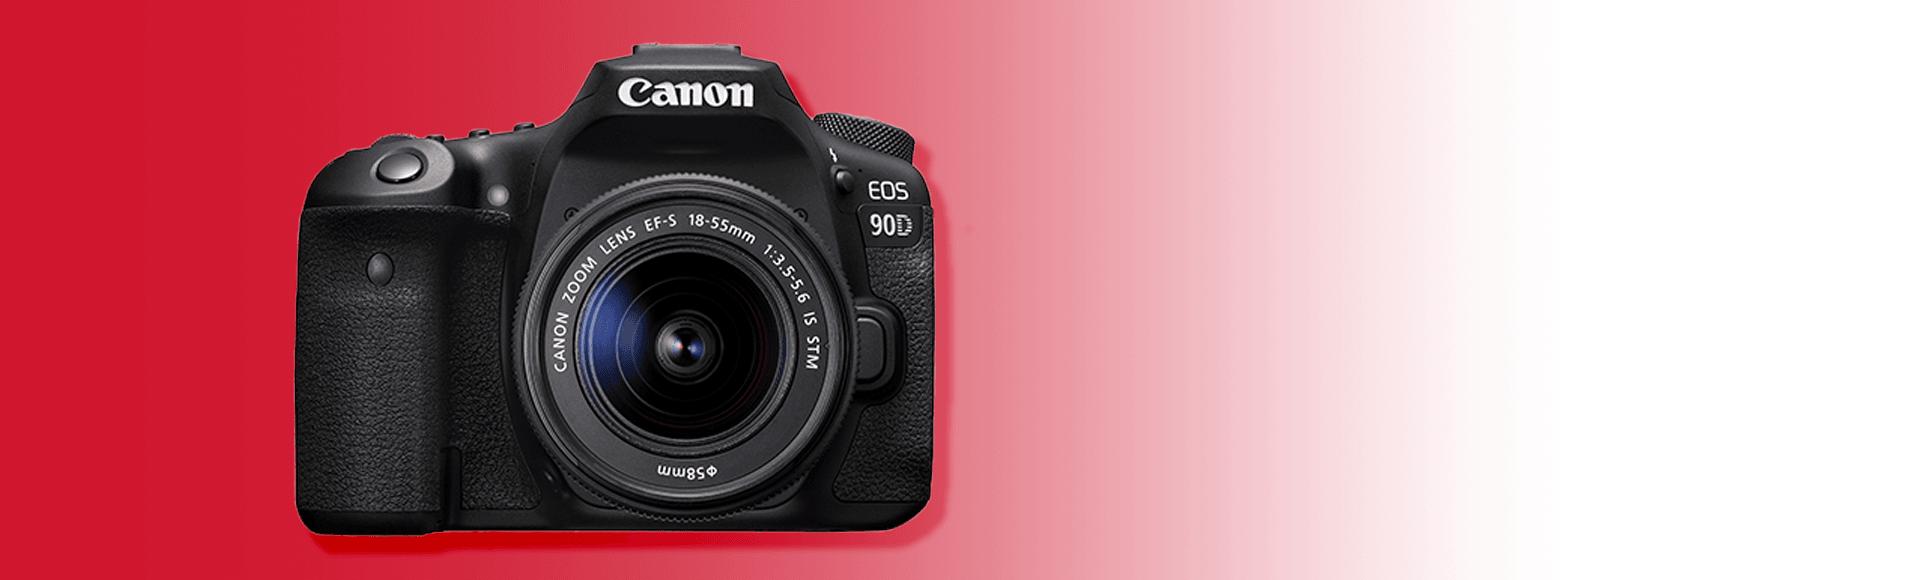 New Canon EOS 90D DSLR